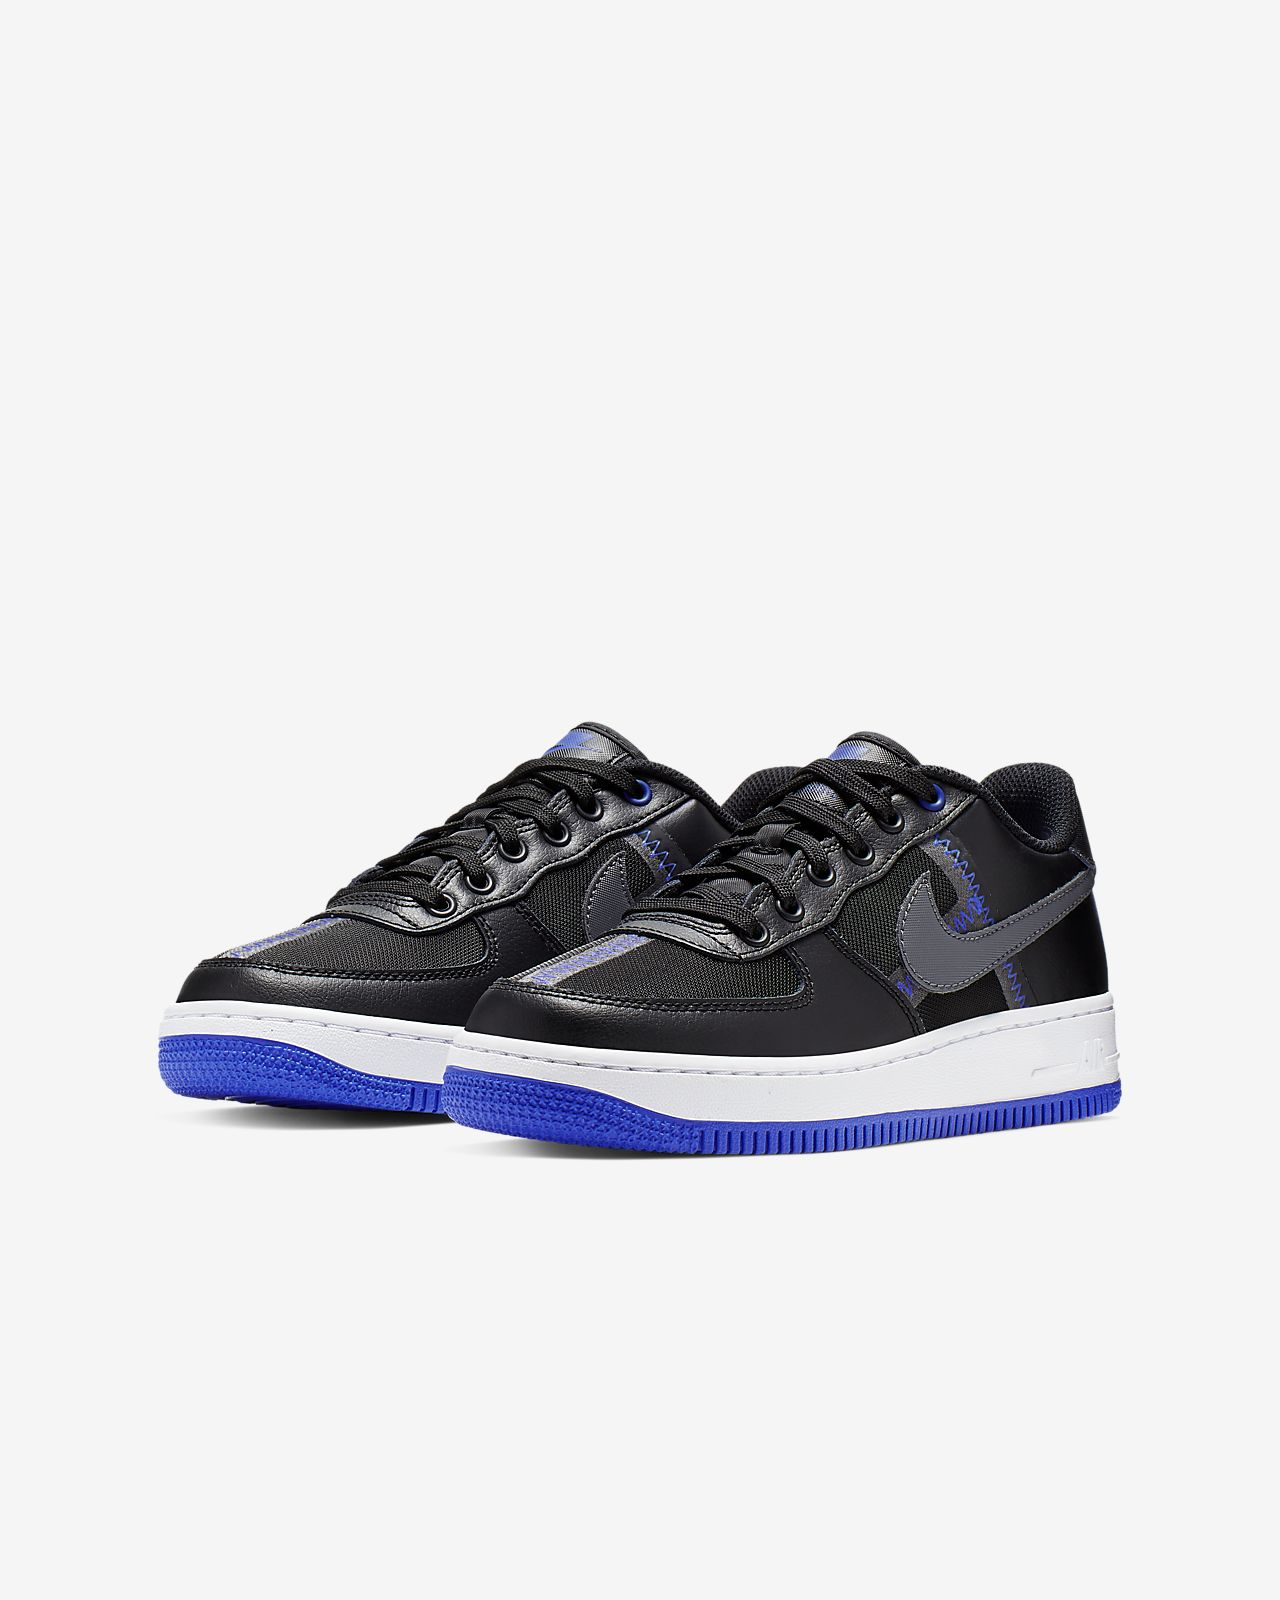 heißer verkauf Nike Air Force 1 LV8 Sneakers Junior   AV0743